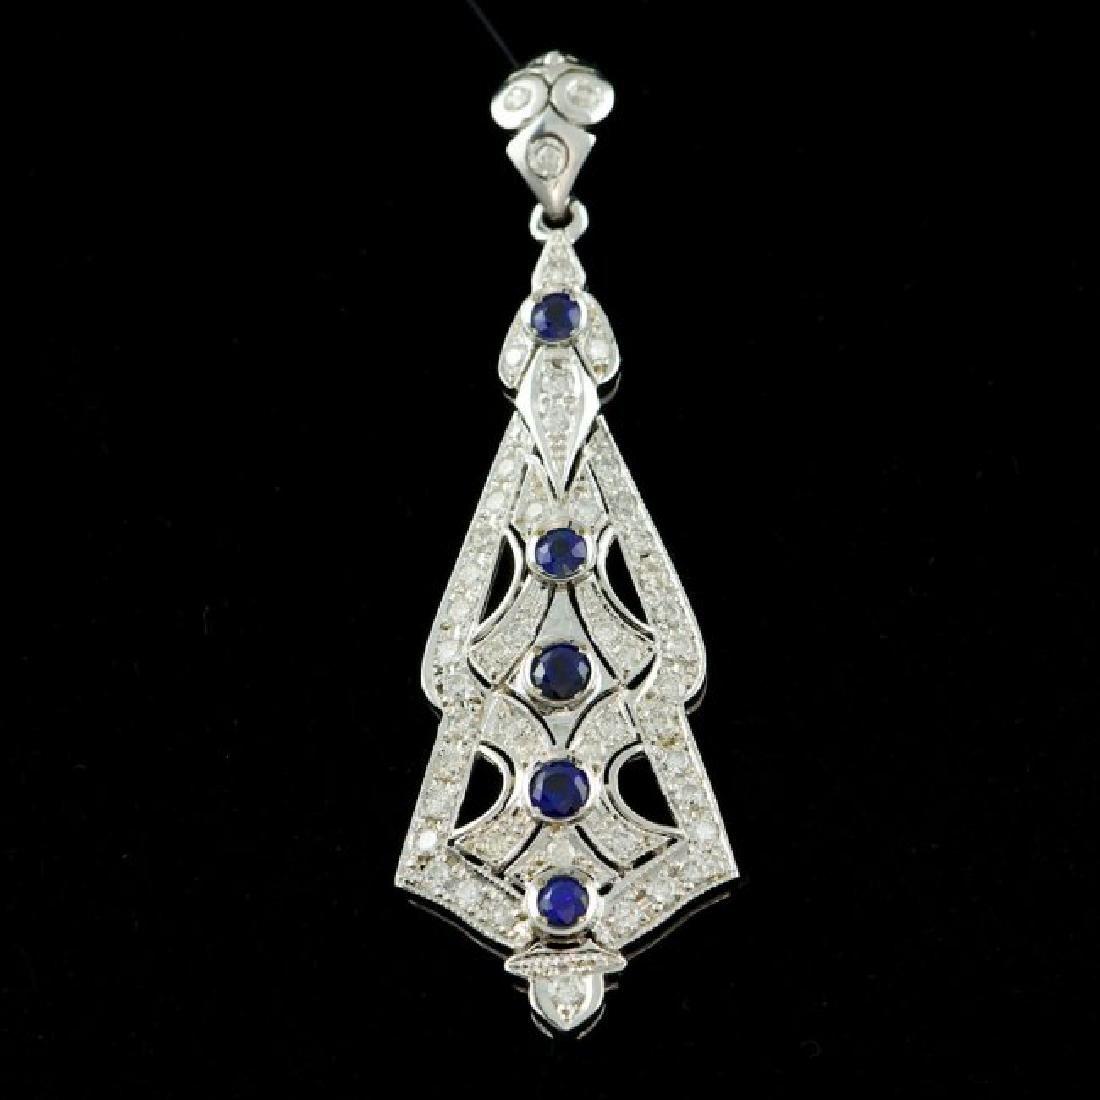 14k Gold 1.30ct Sapphire 2.05ct Diamond Pendant